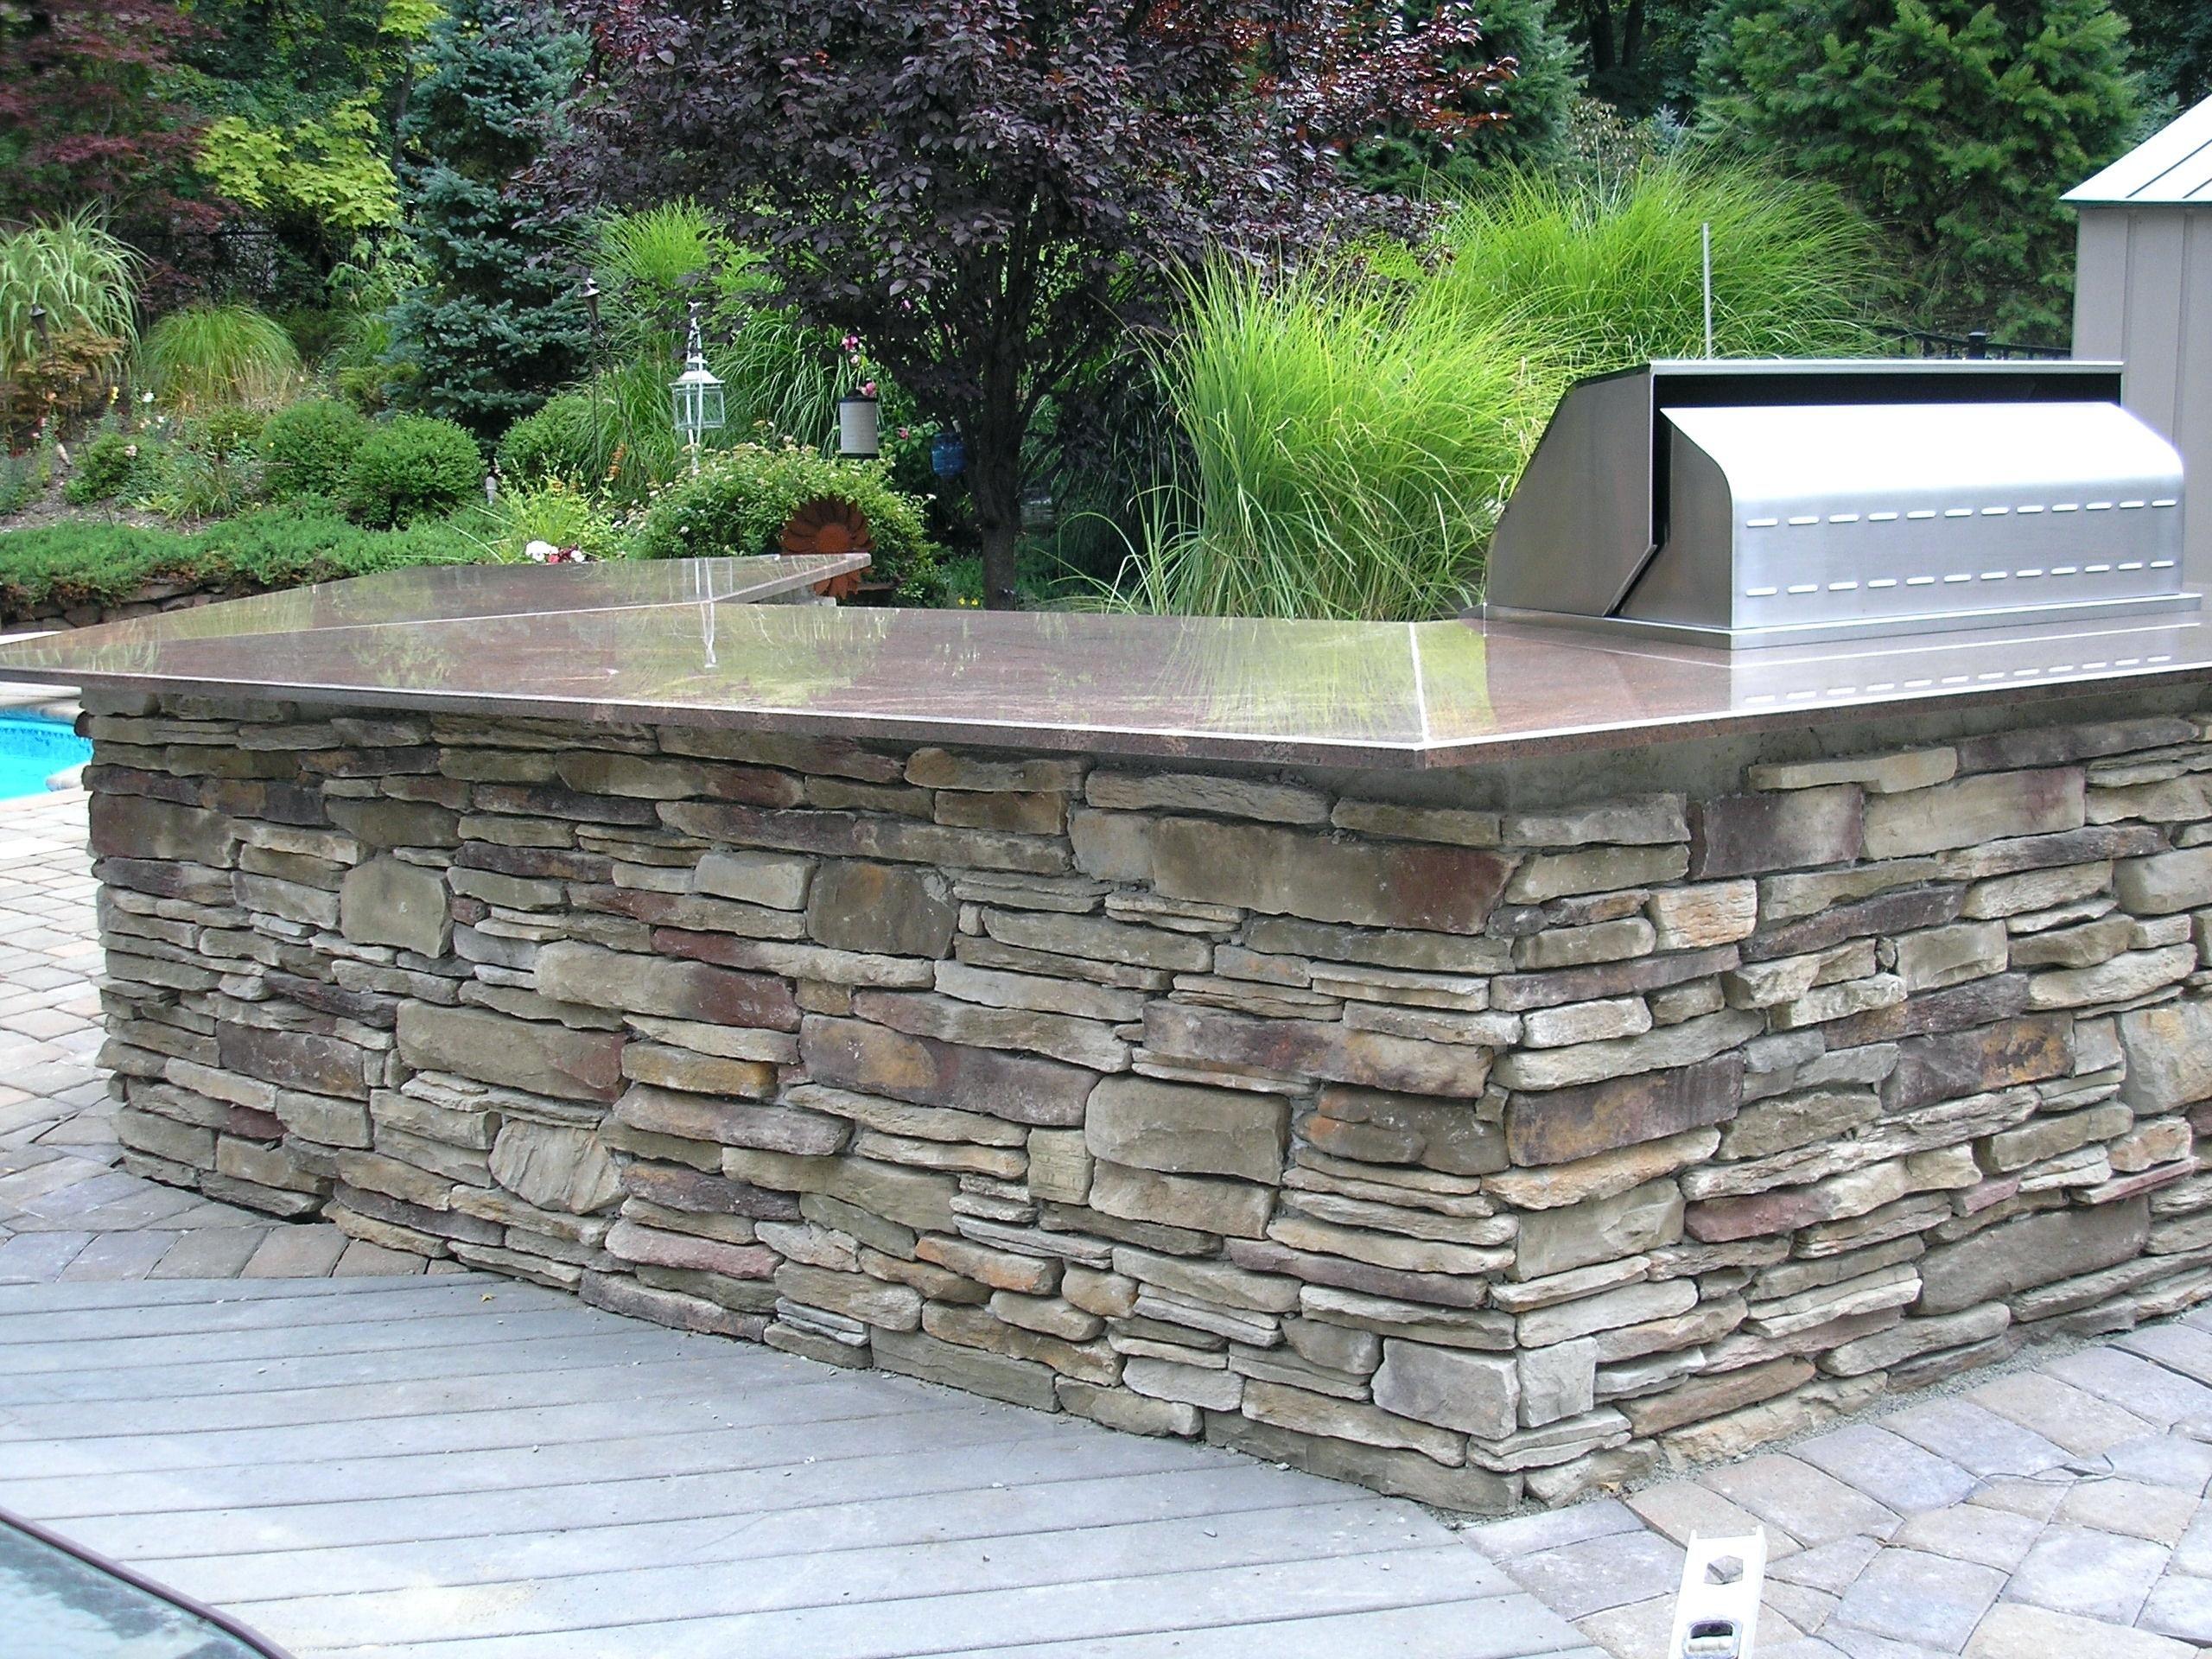 Outdoor Stone Veneer Canada Grill Cost Outdoor Stone Outdoor Kitchen Countertops Diy Outdoor Kitchen